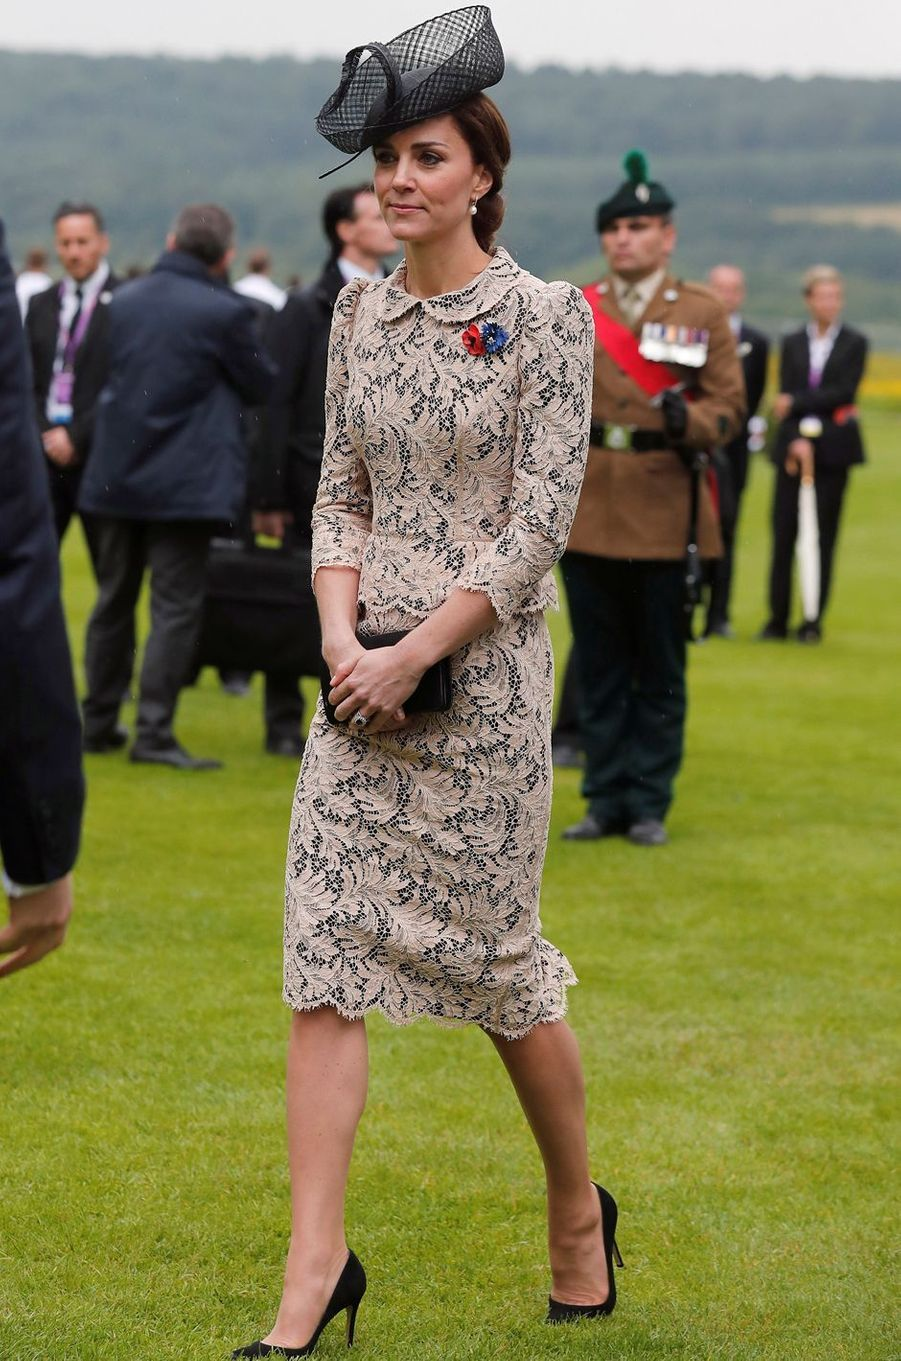 Kate Middleton le 1er juillet 2016 dans une robe Sophie Hallette/Dolce & Gabbana estimée à 3 000 livres